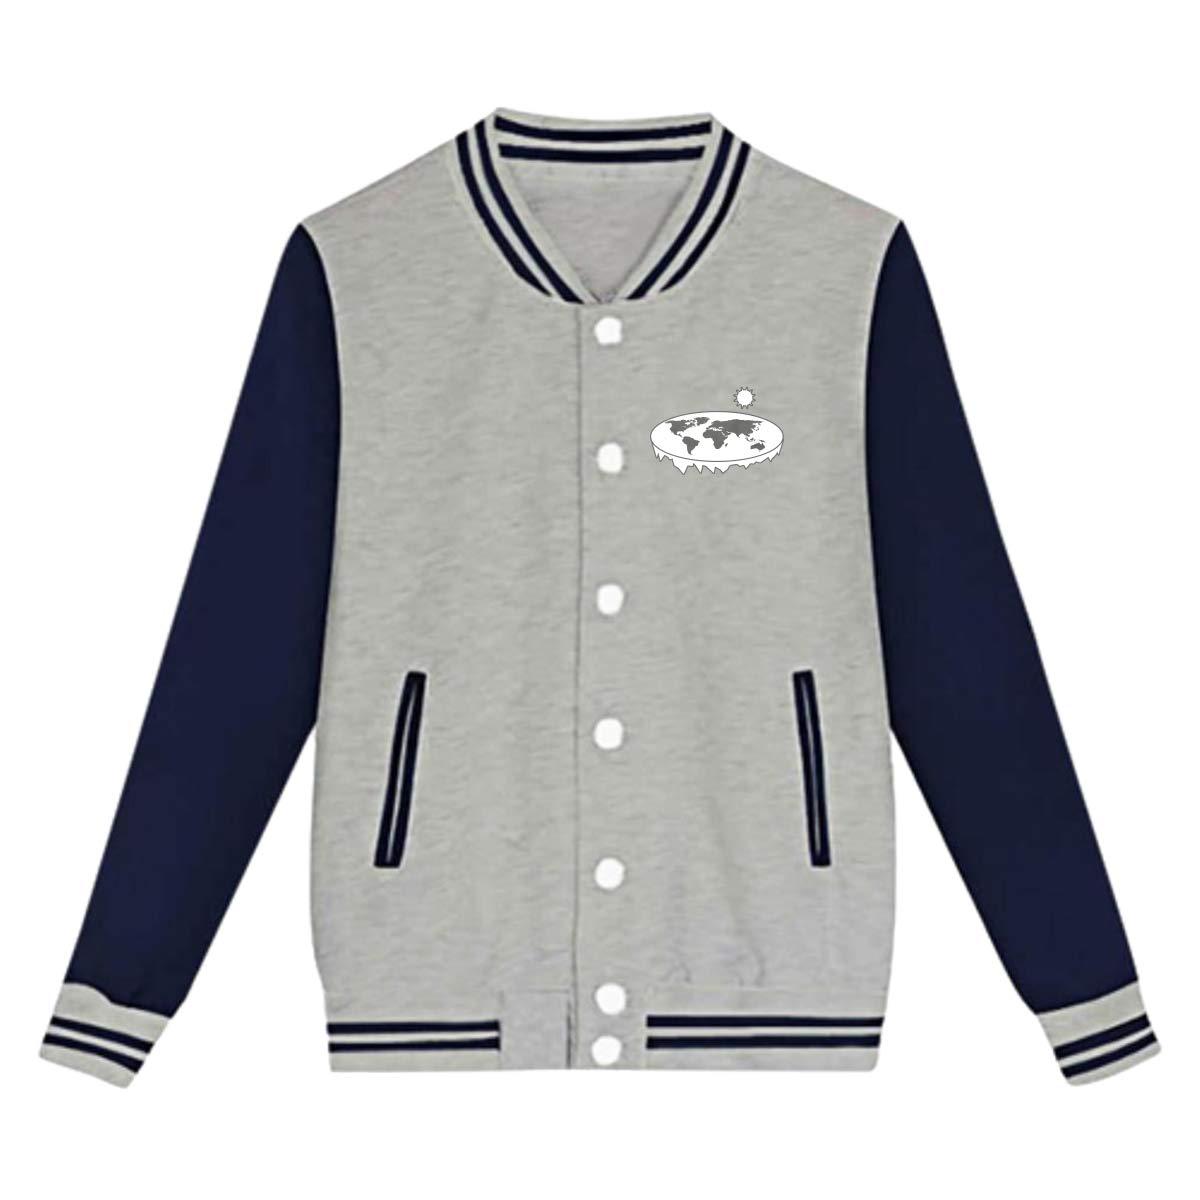 Tina TN Flat Earth Society Teens Boys Girl Varsity Baseball Jacket Long Sleeve Sport Baseball Uniform Jacket Coat Sweater Black